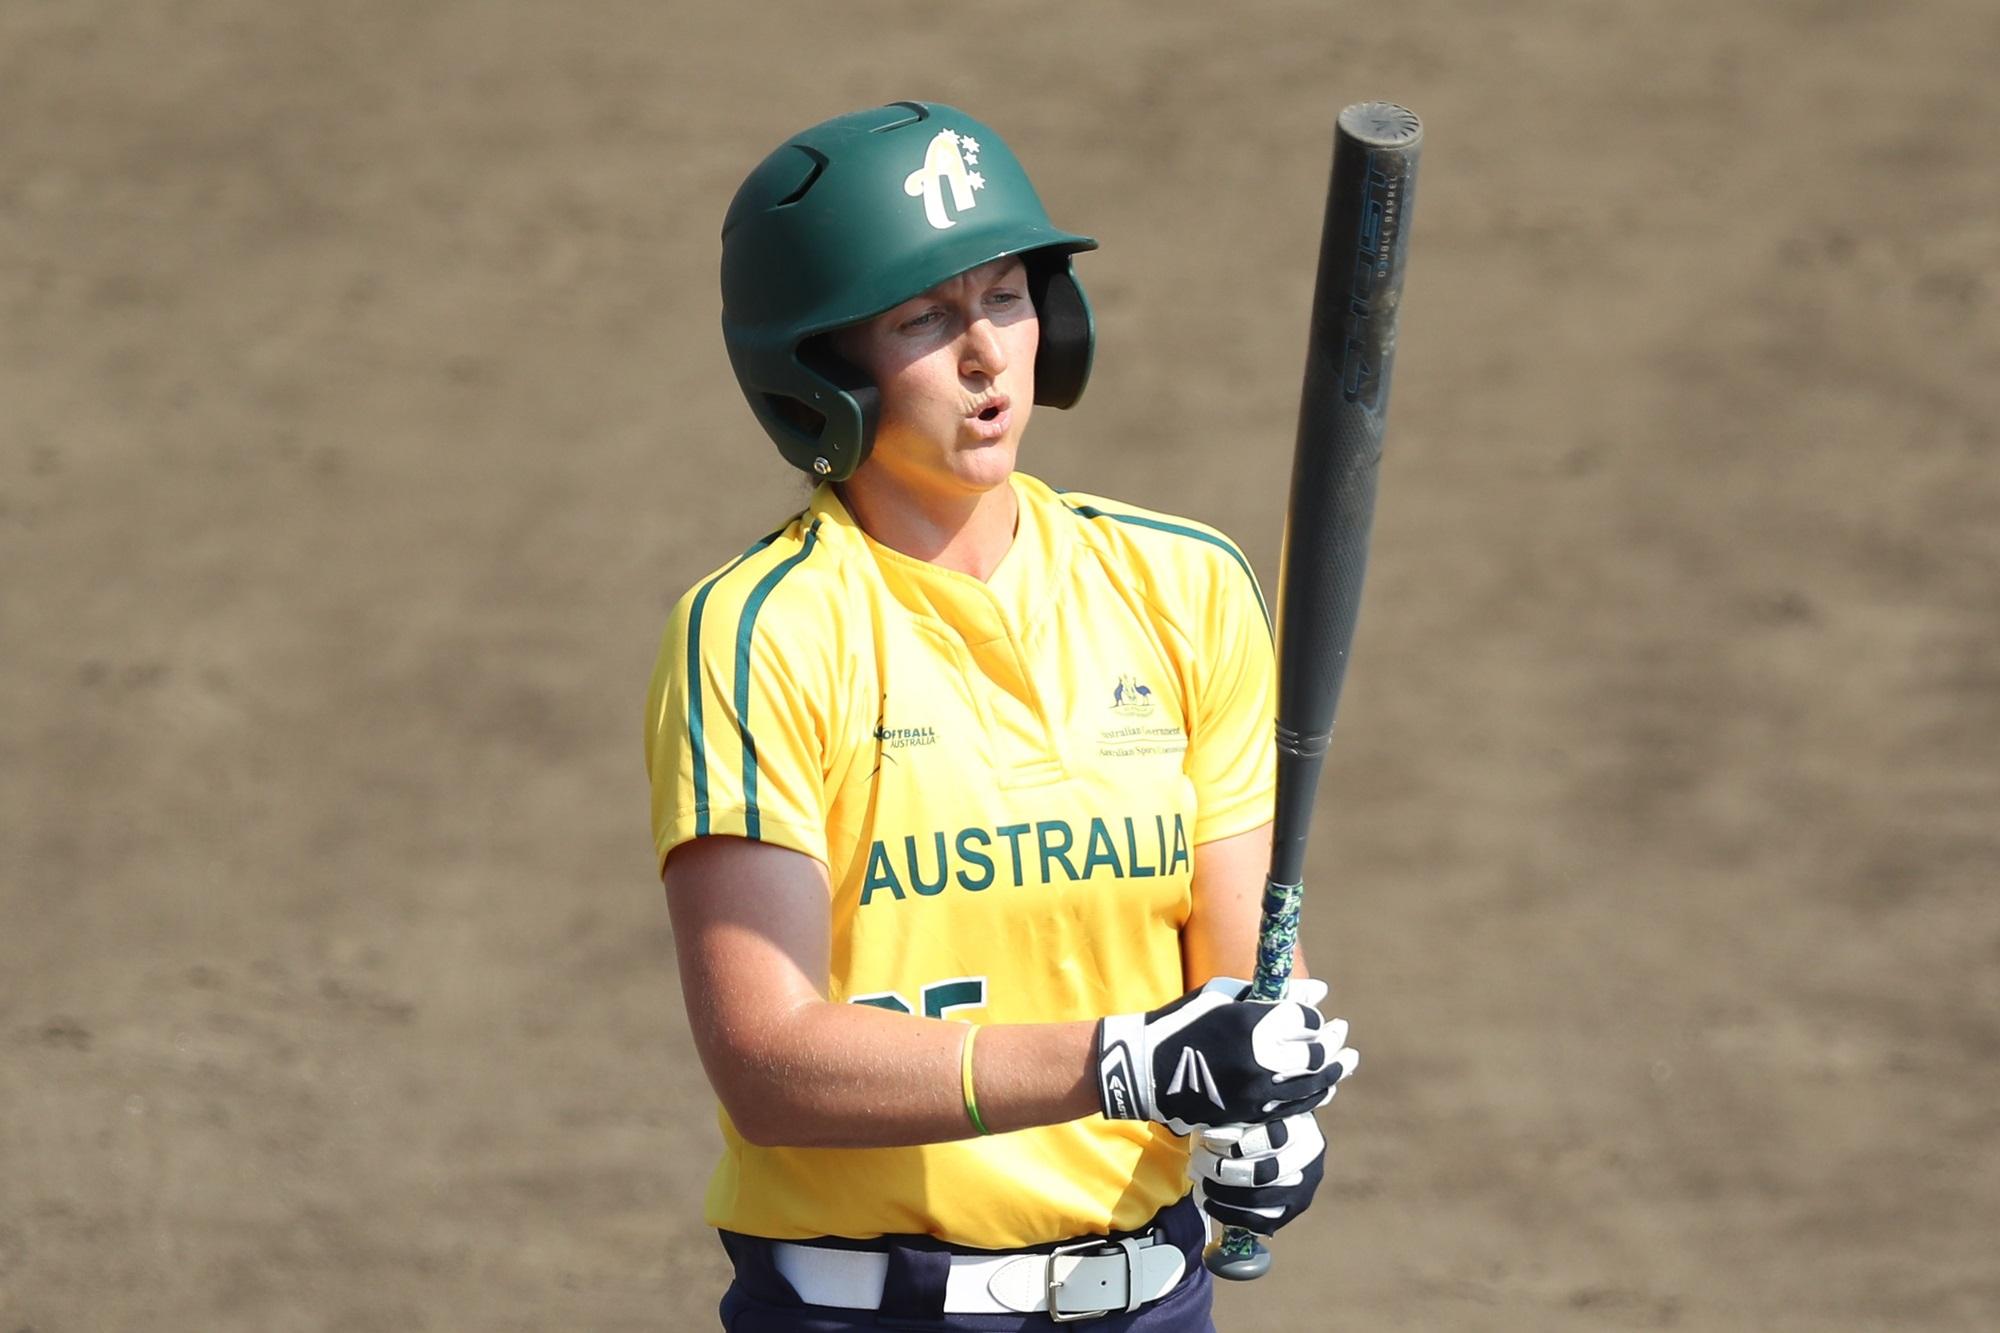 Chelsea Forkin of Australia